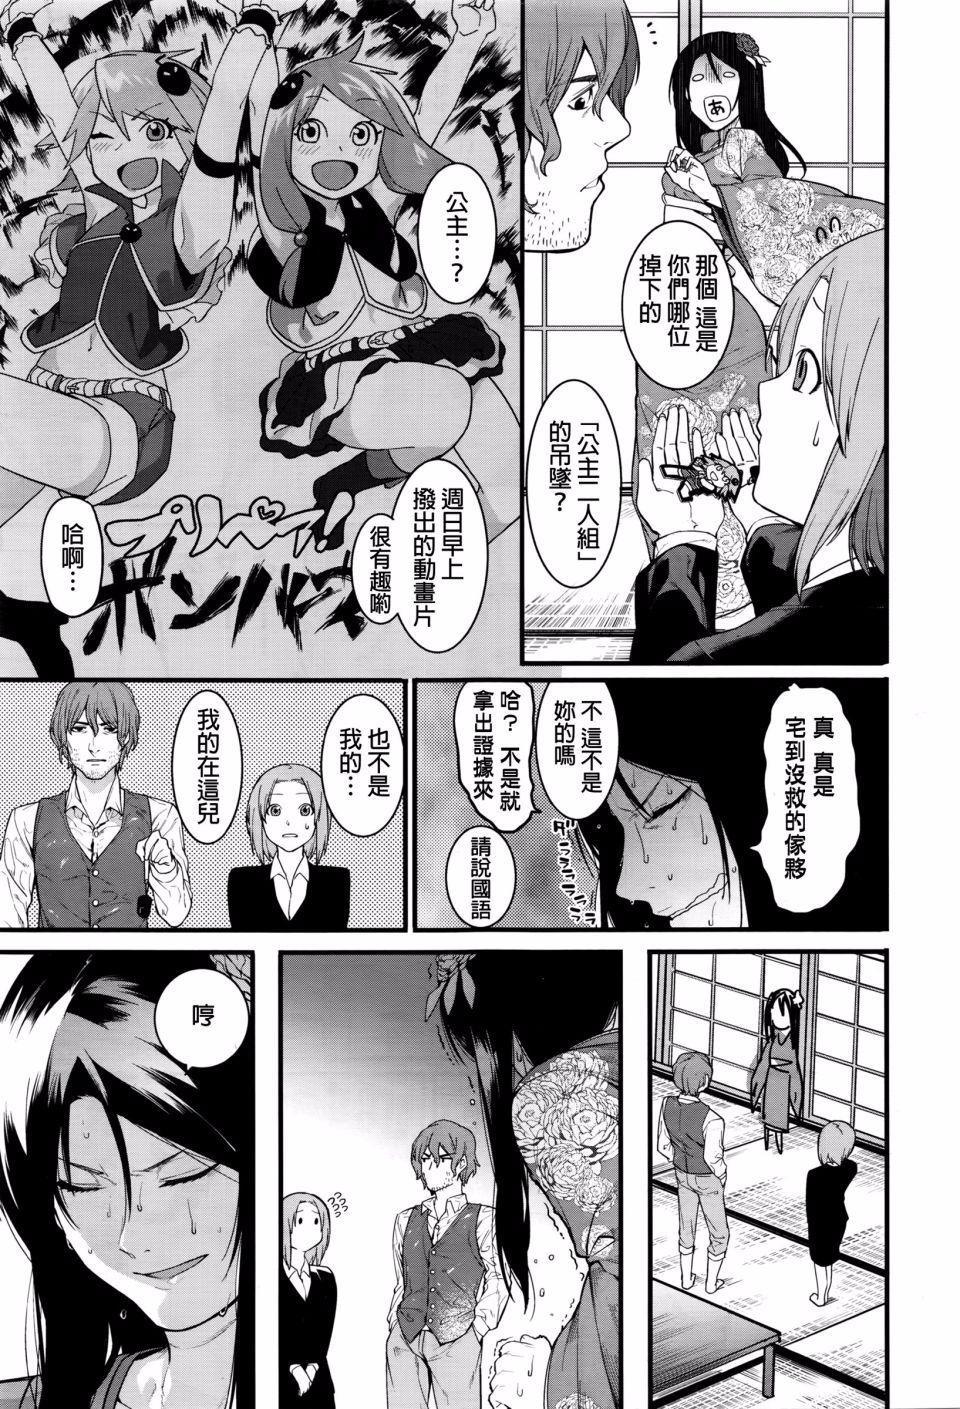 Fukurai Re to leftovers 4